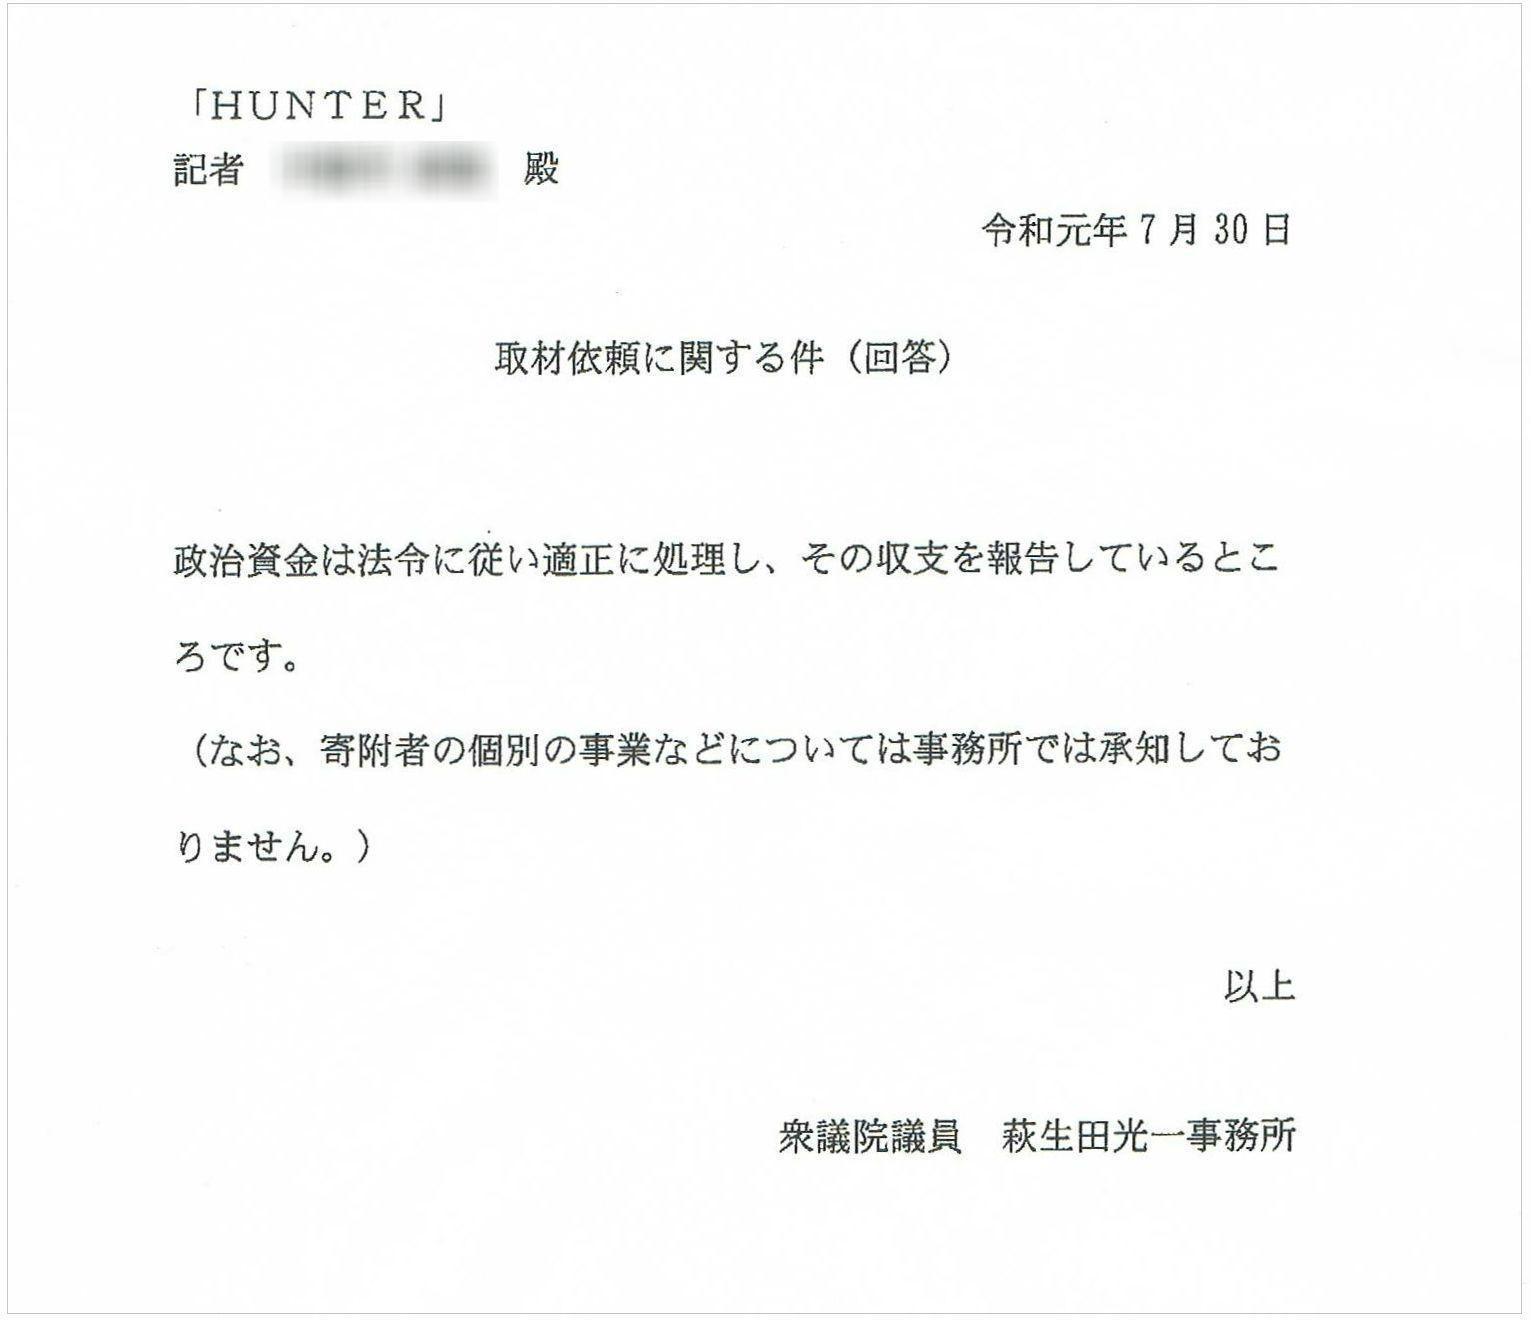 http://hunter-investigate.jp/news/81b1122535a5db0ab74bc01287d6013a31d59ede.jpg